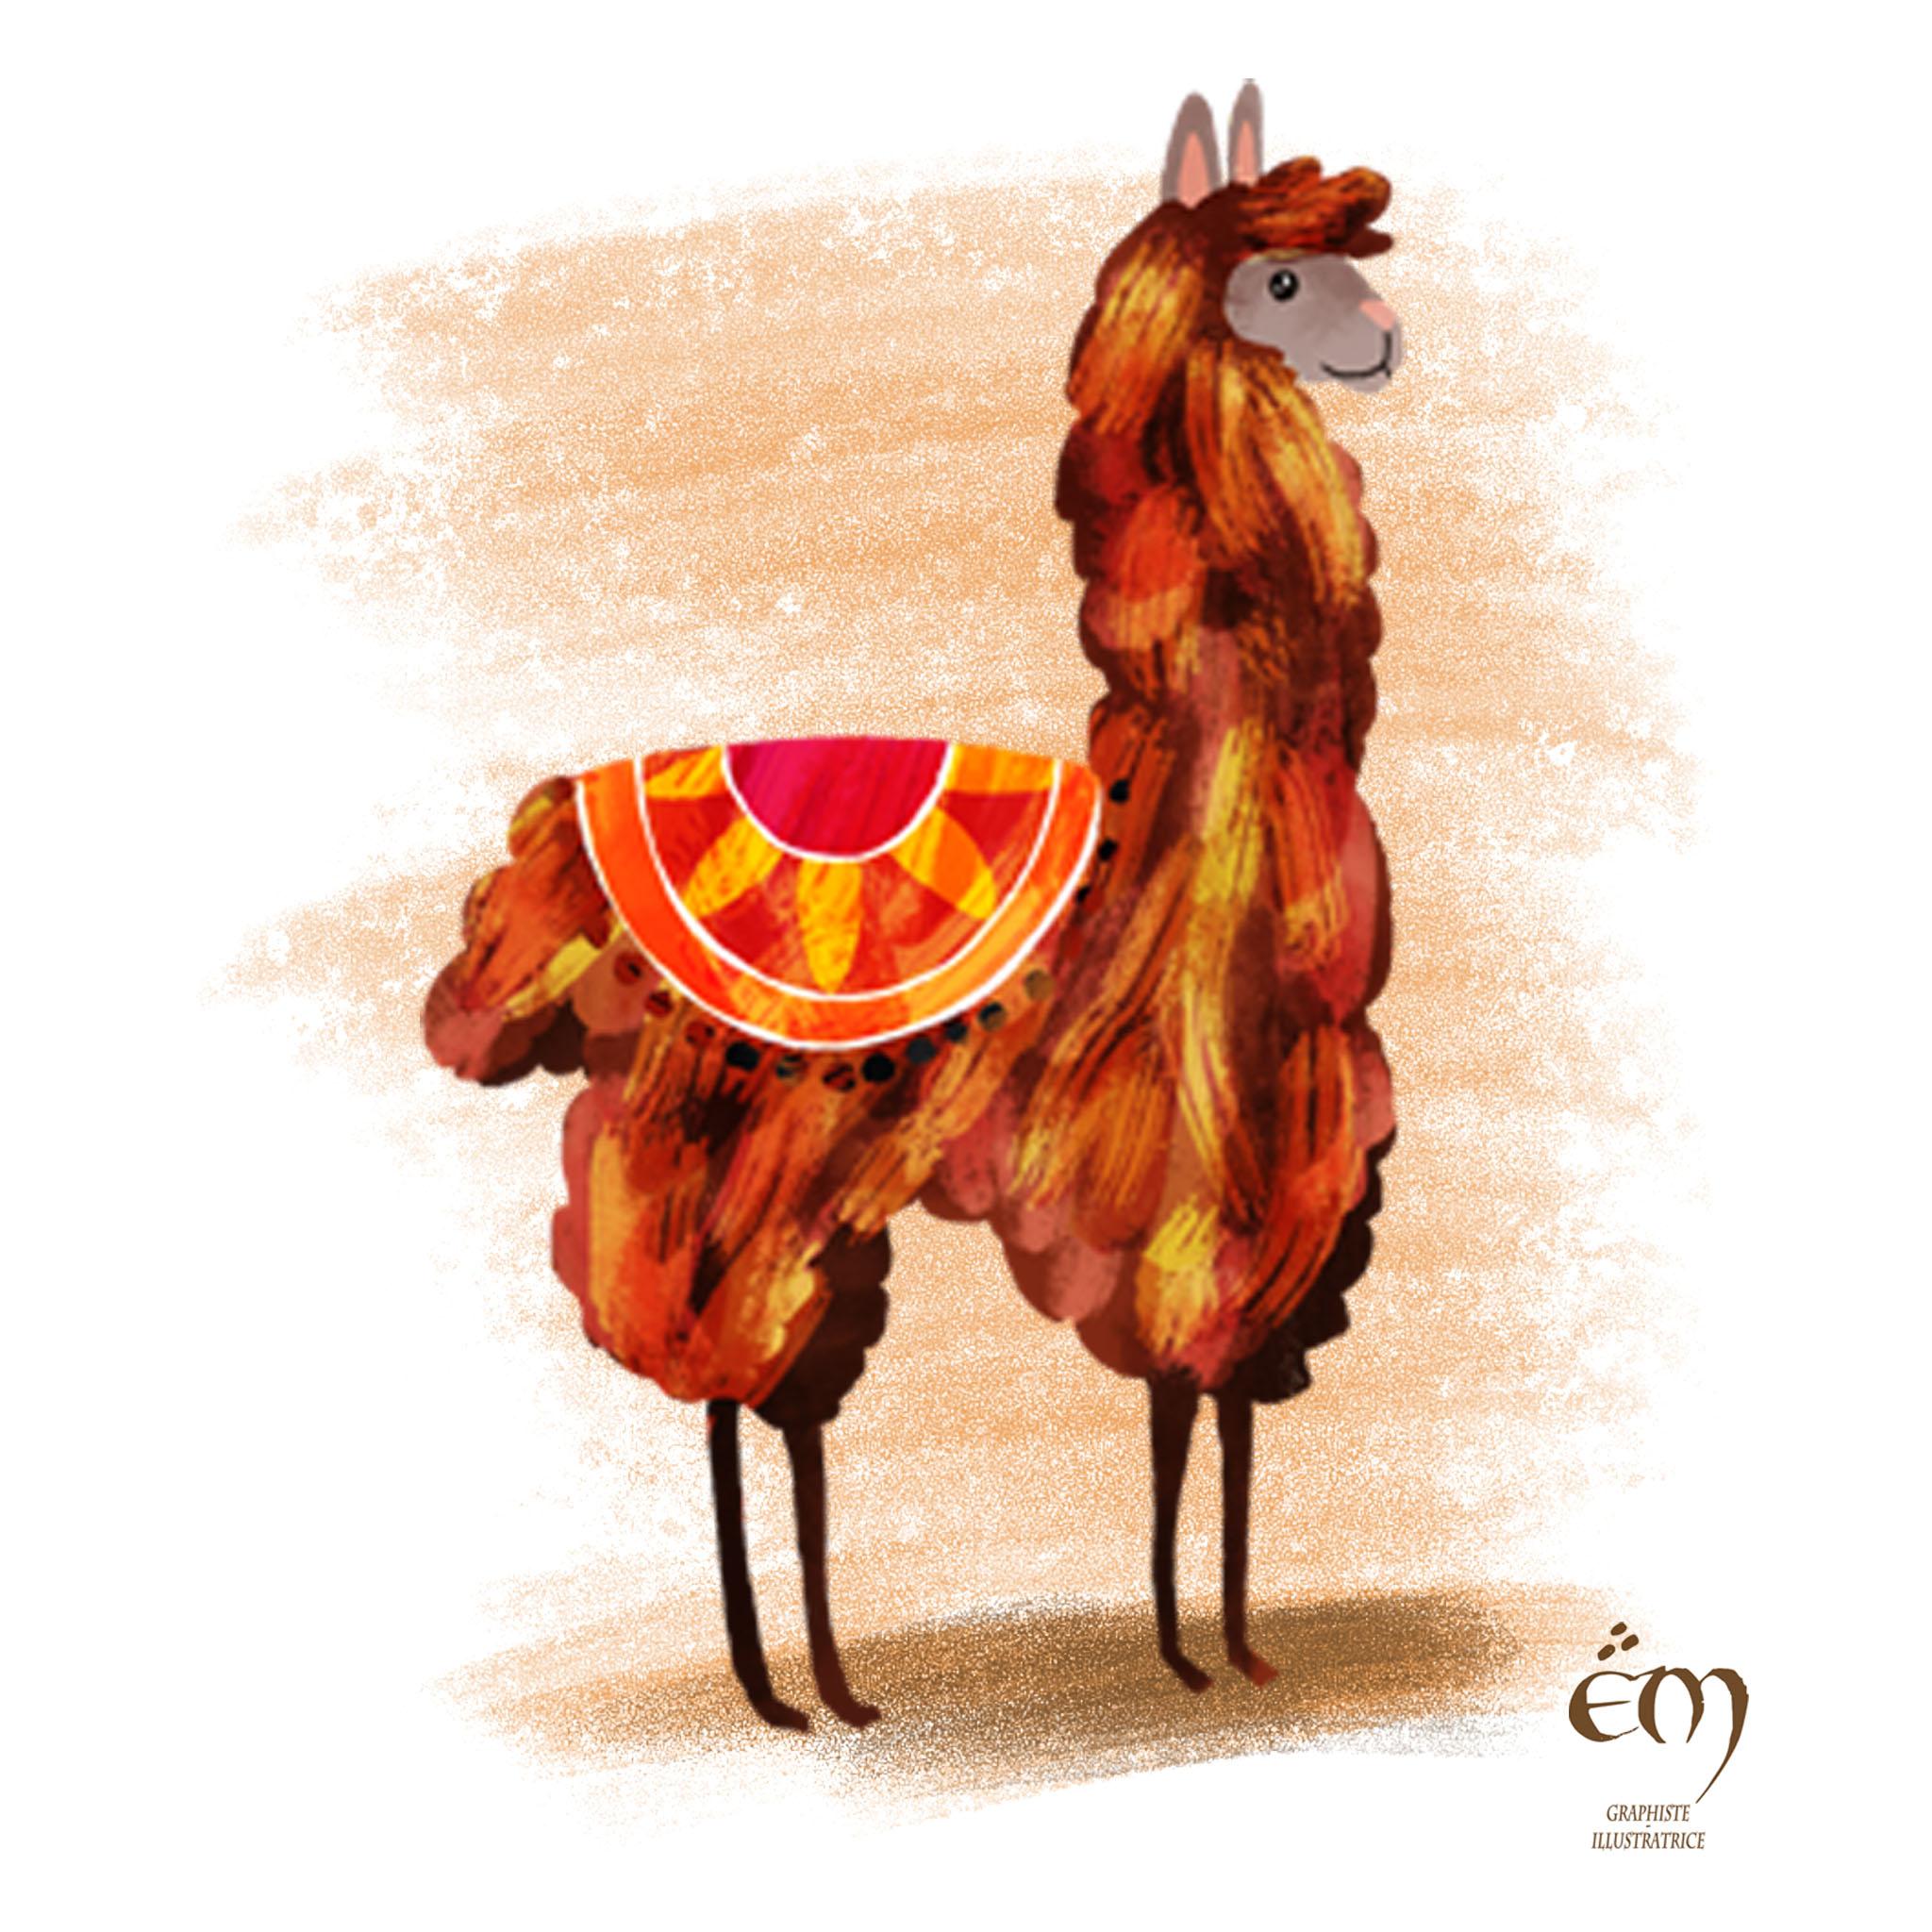 "ANIMAL ILLUSTRATION ""Un lama"" Peinture numérique  ""A llama"" Digital painting"